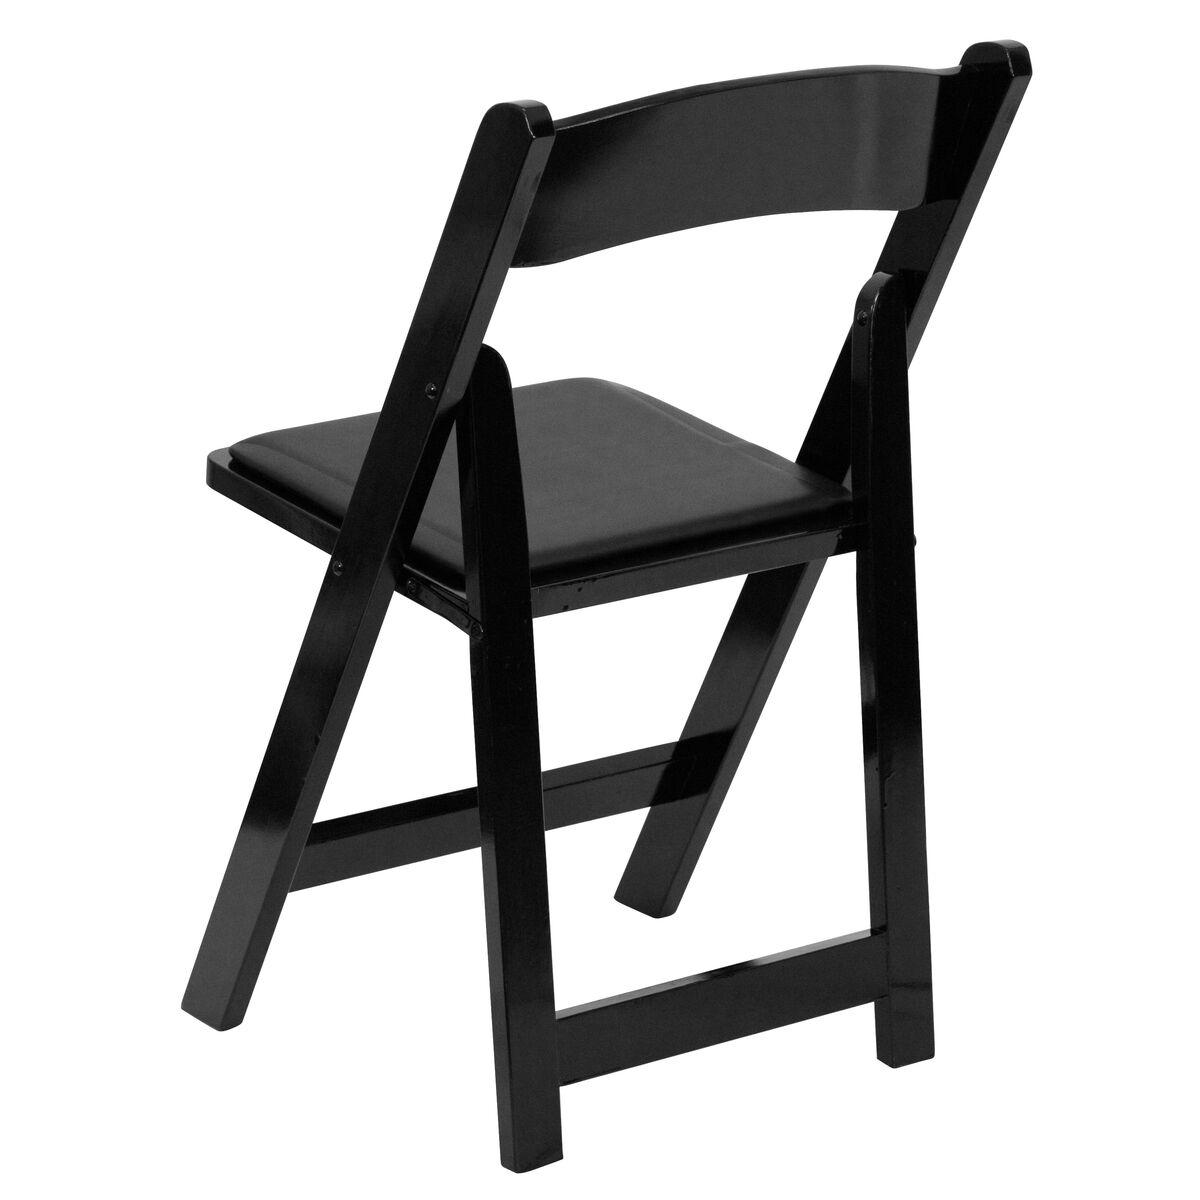 black wood folding chair xf 2902 bk wood gg foldingchairs4less com